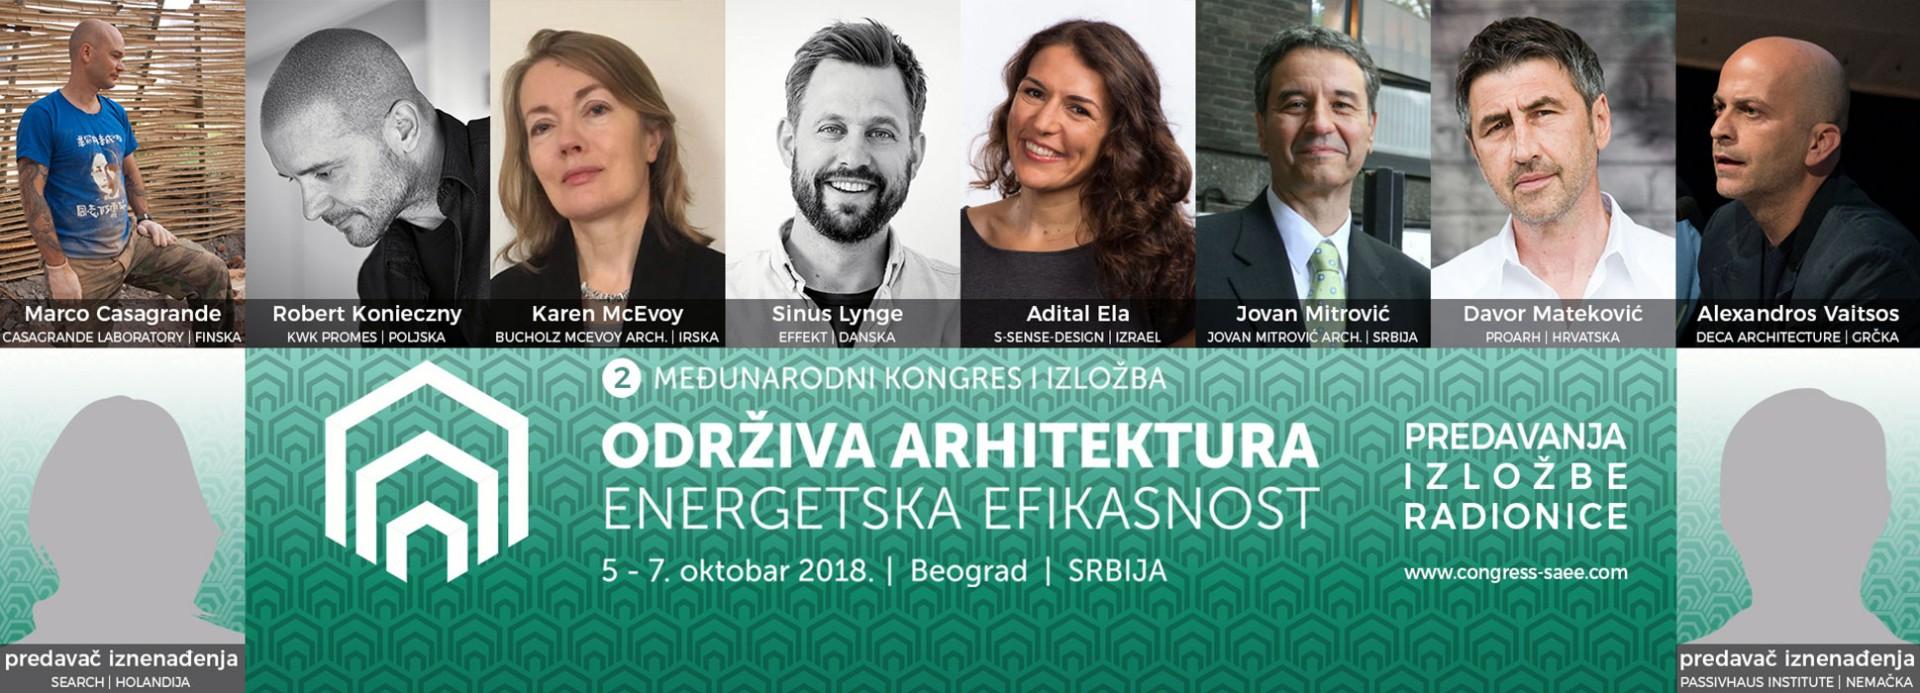 Други међународни конгрес: Одржива архитектура – енергетска ефикасност (6-7. октобар 2018.)